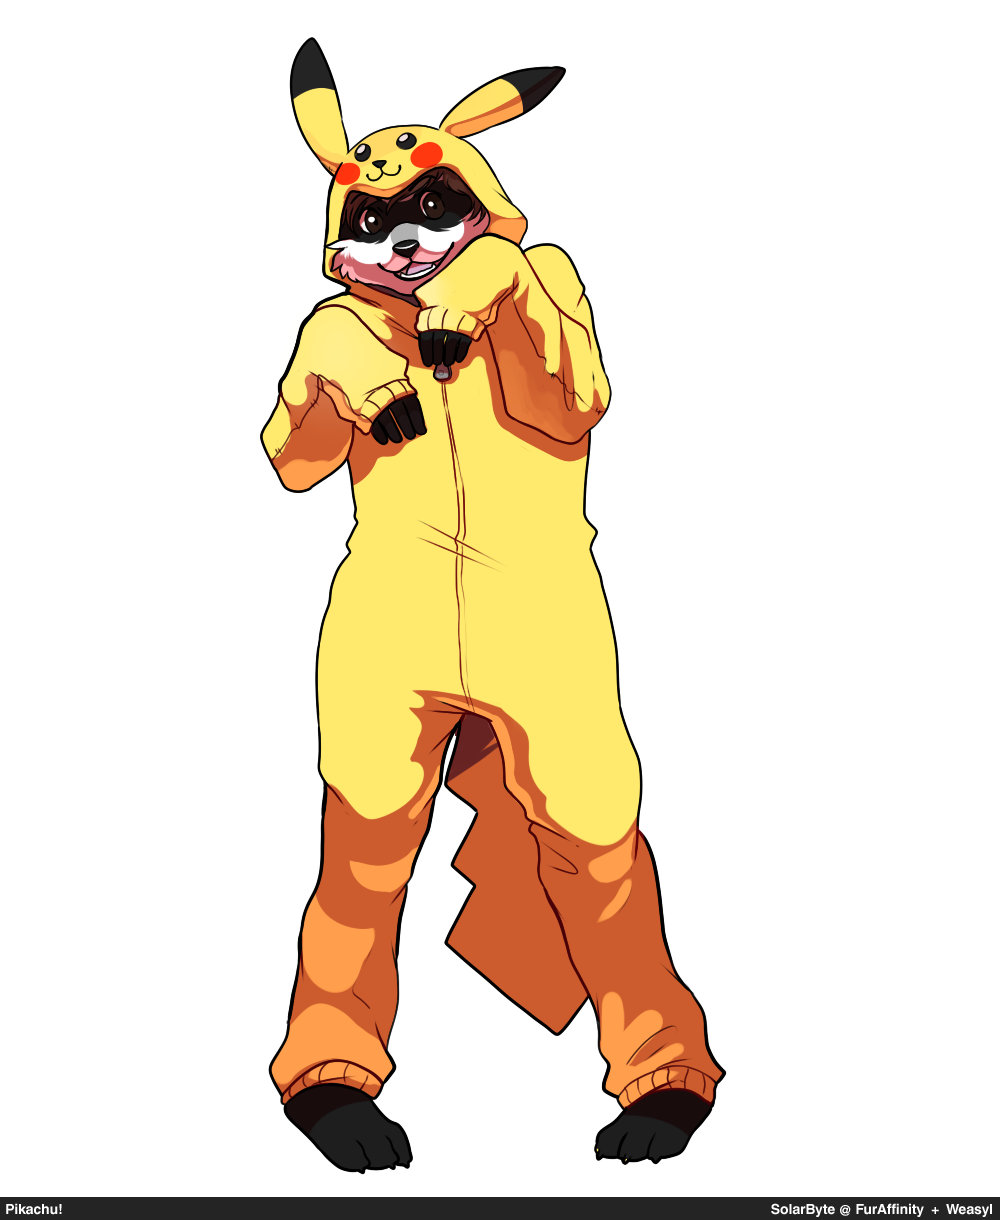 Most recent image: Pikachu! (SolarByte)